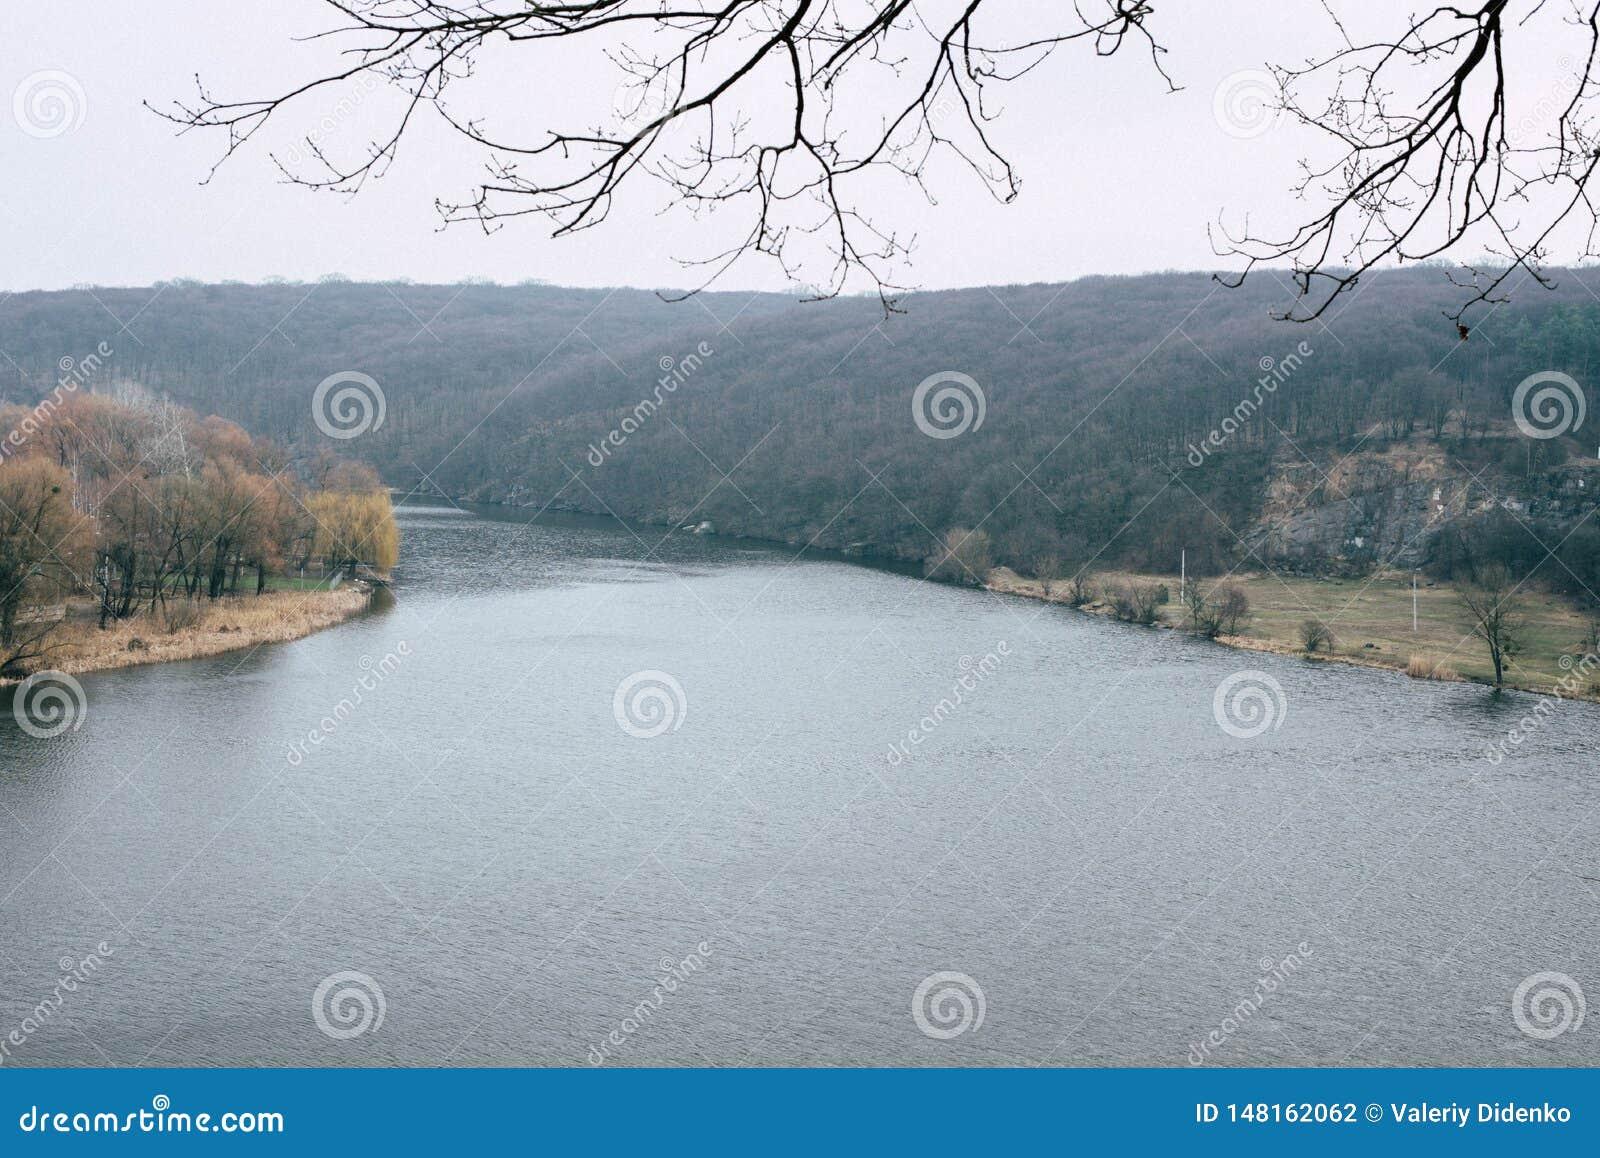 Walk around the Southern Bug River, Ukraine